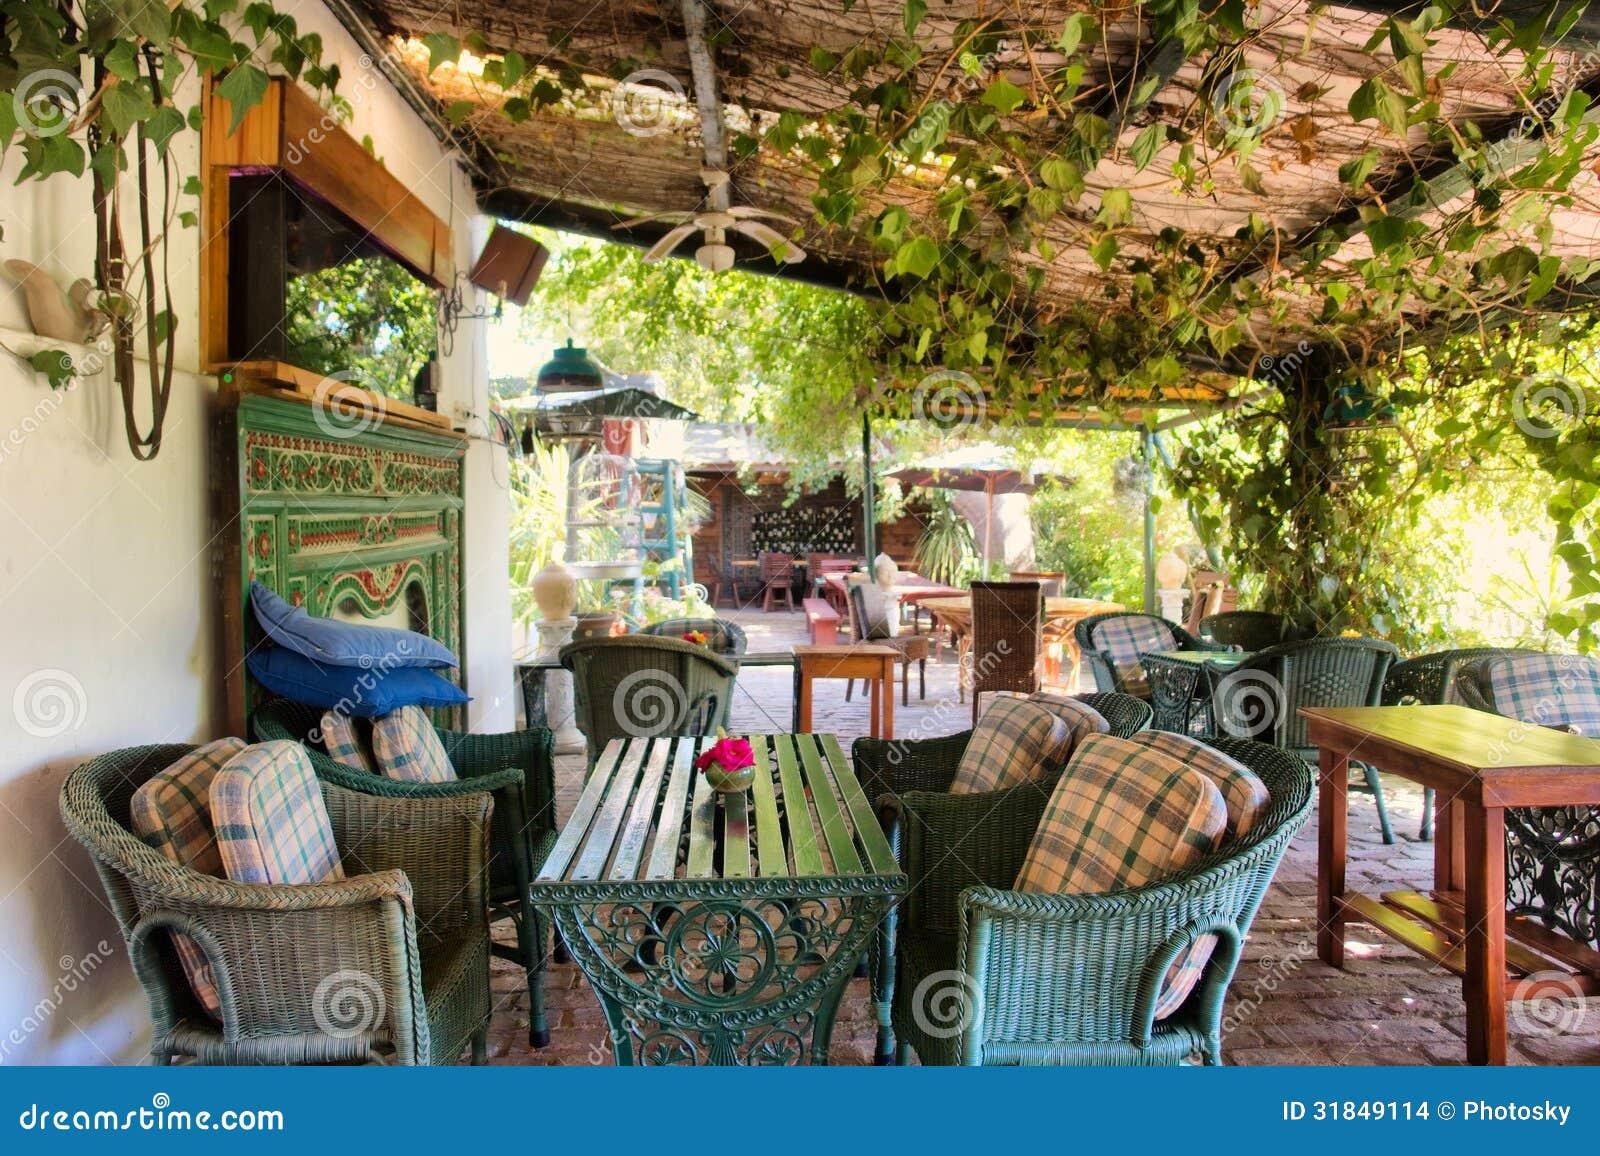 Outdoor Thai restaurant